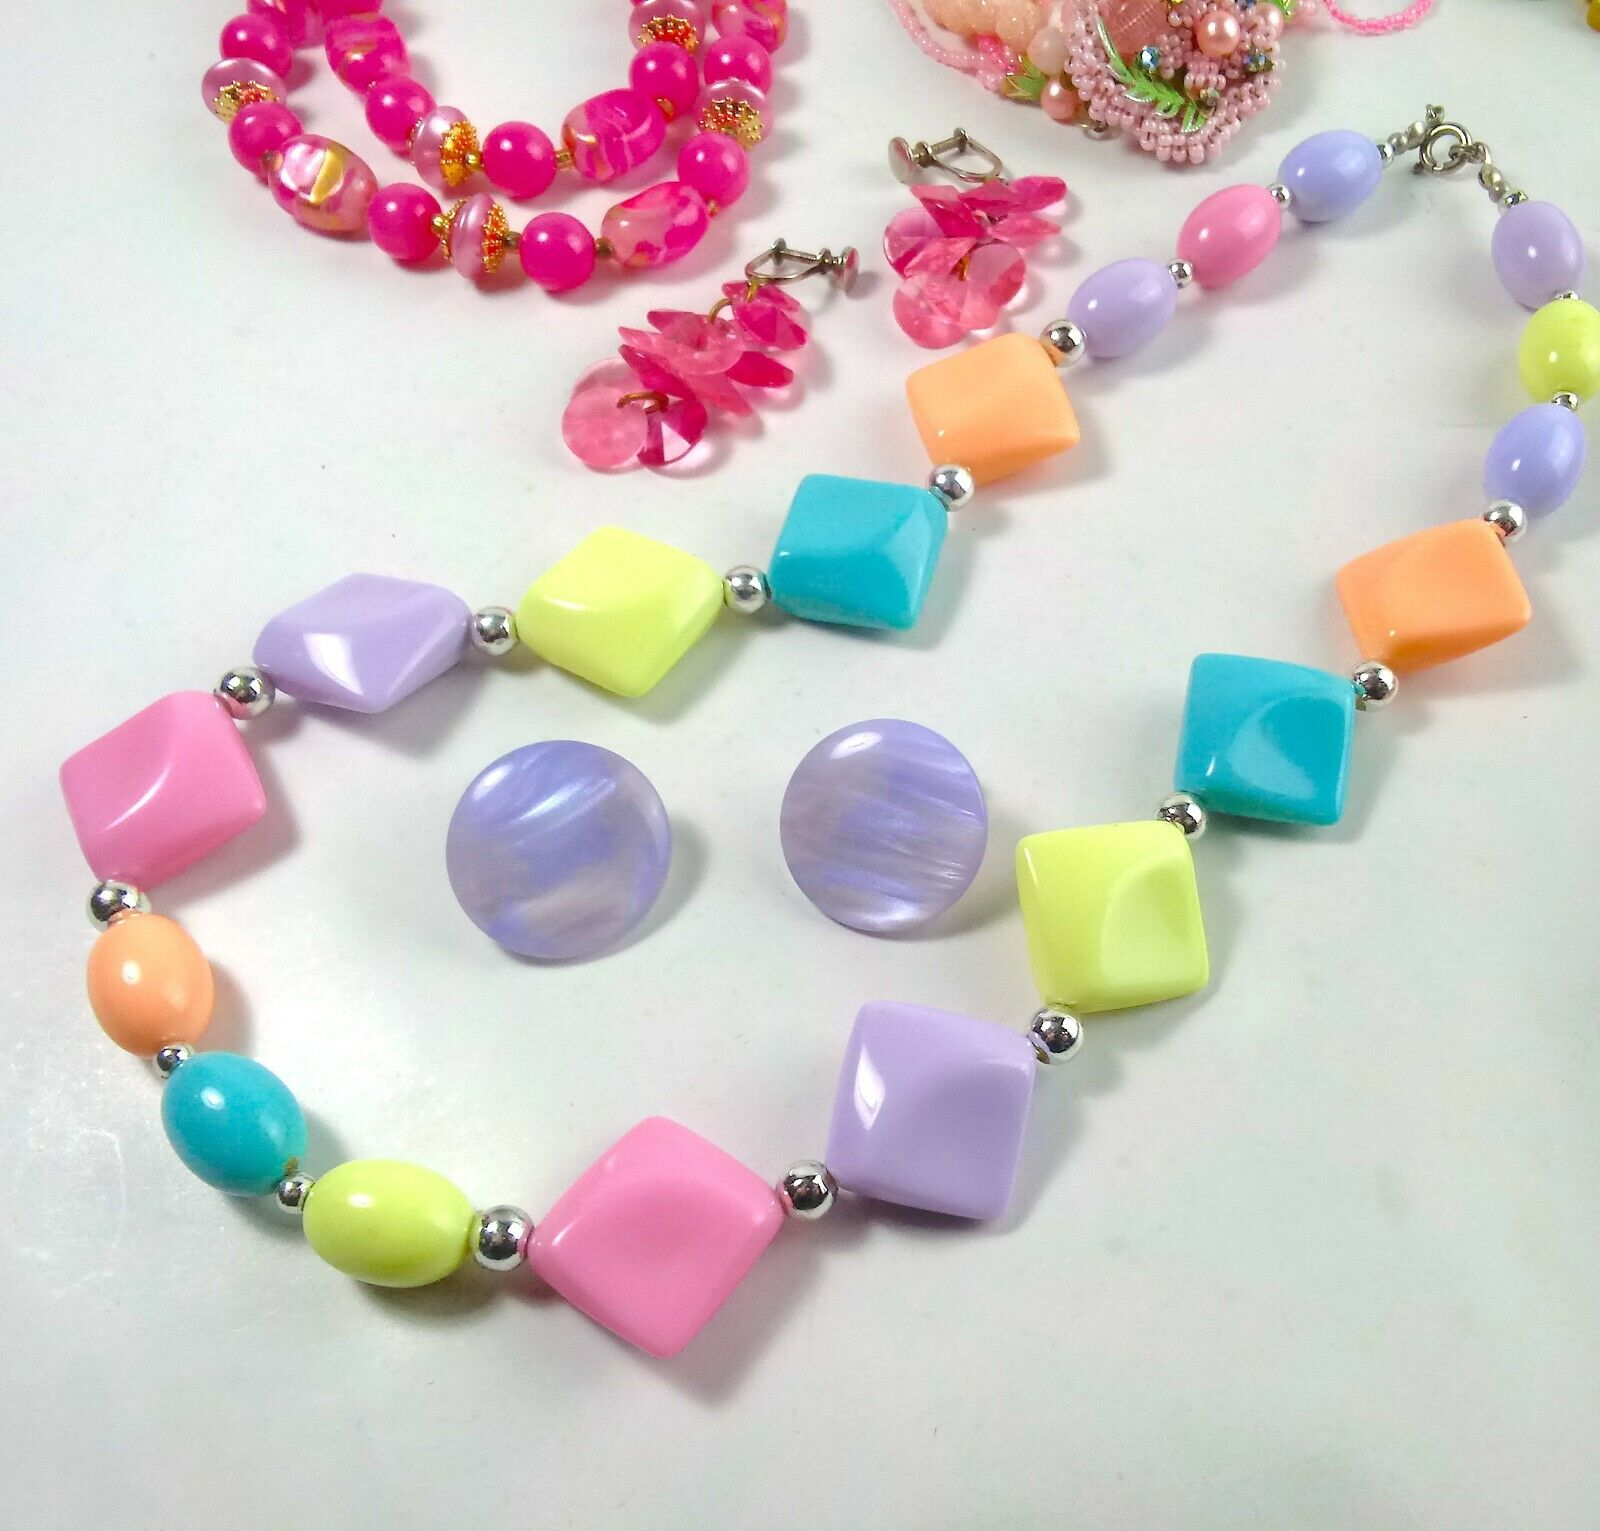 Costume Jewelry Lot Necklaces Bracelet Earrings - image 5